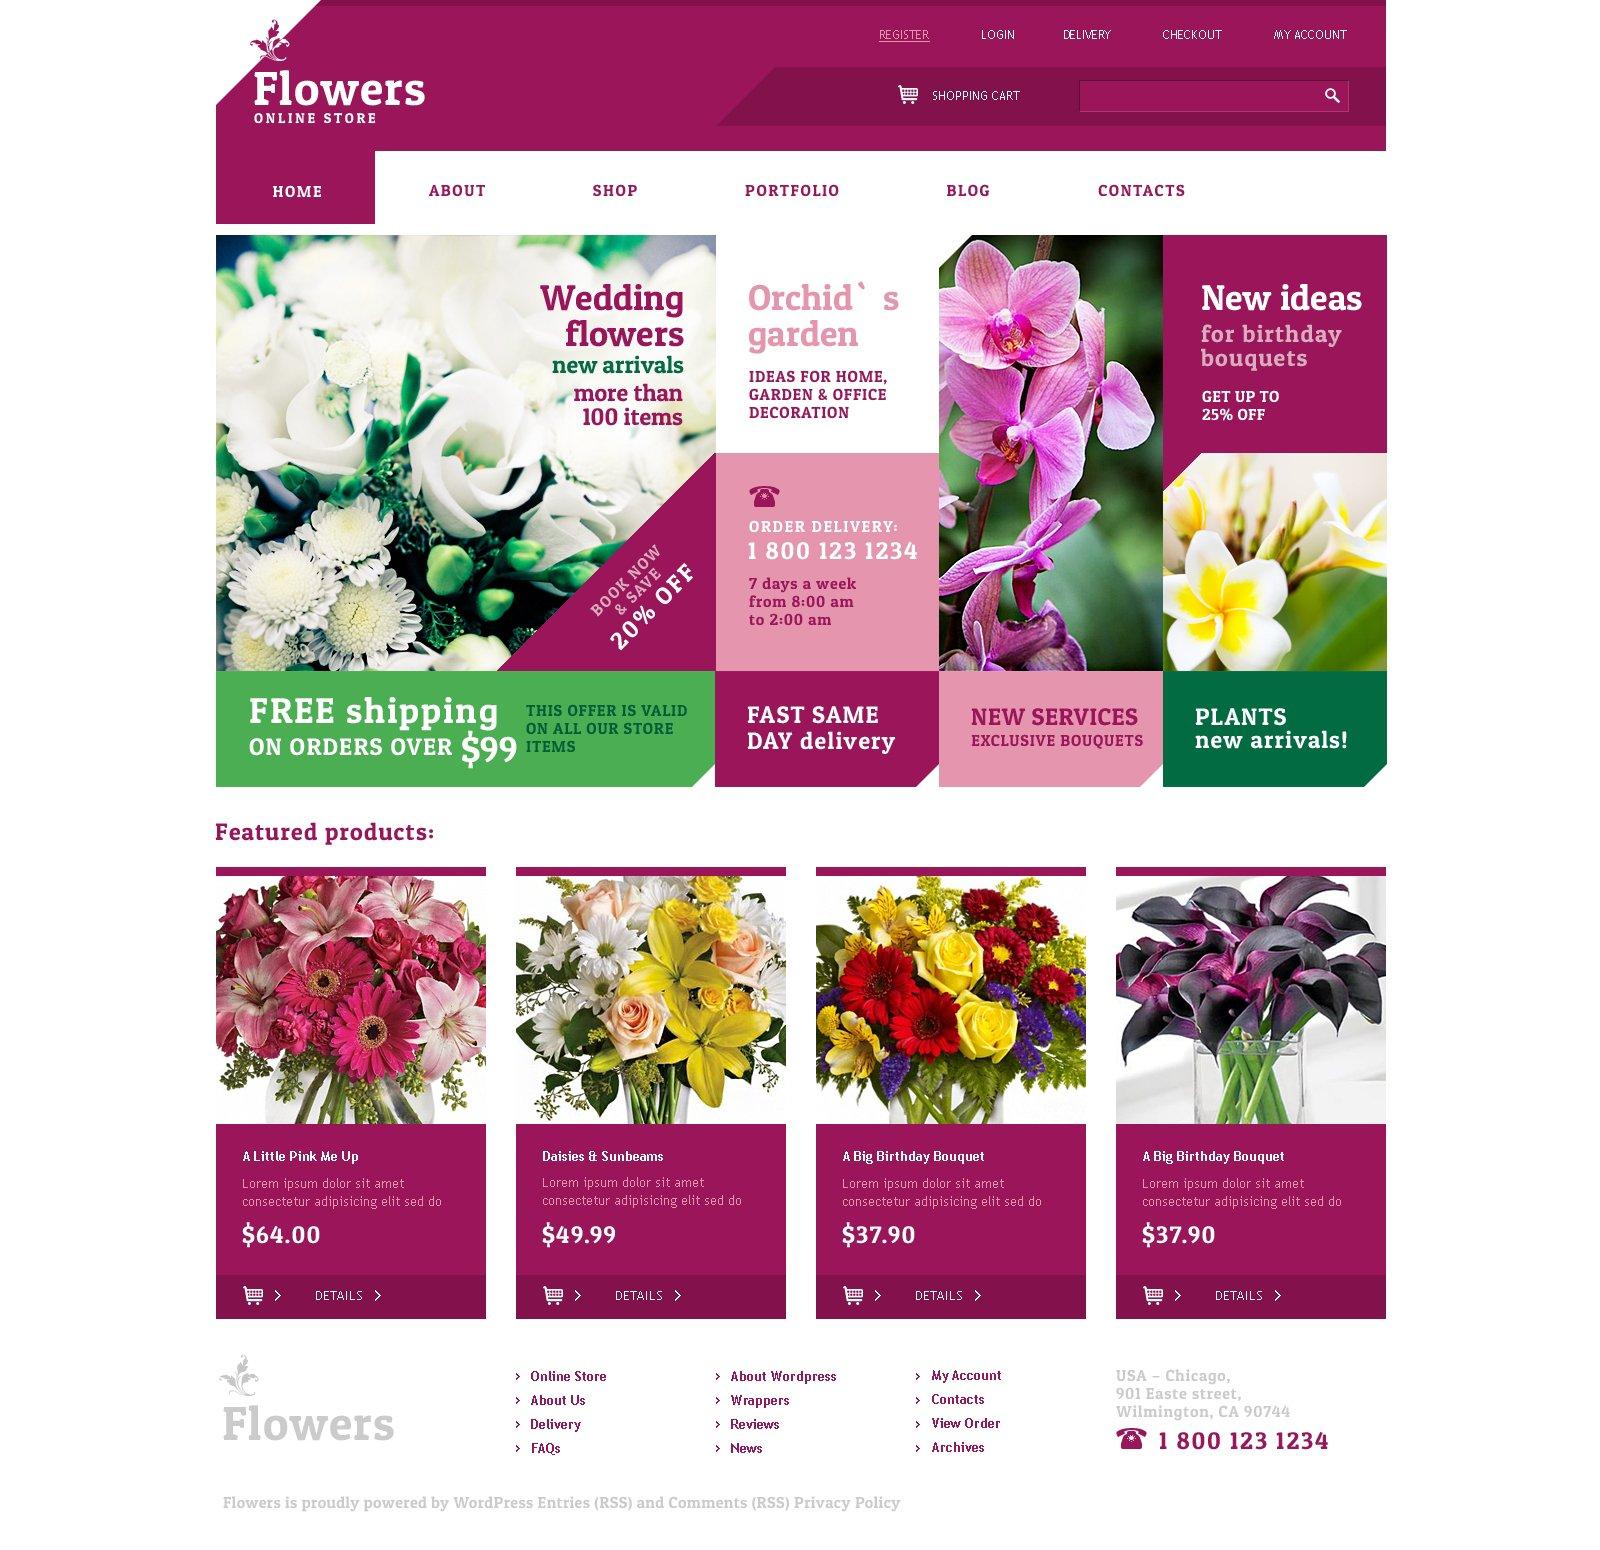 Flower Shop Templates | TemplateMonster